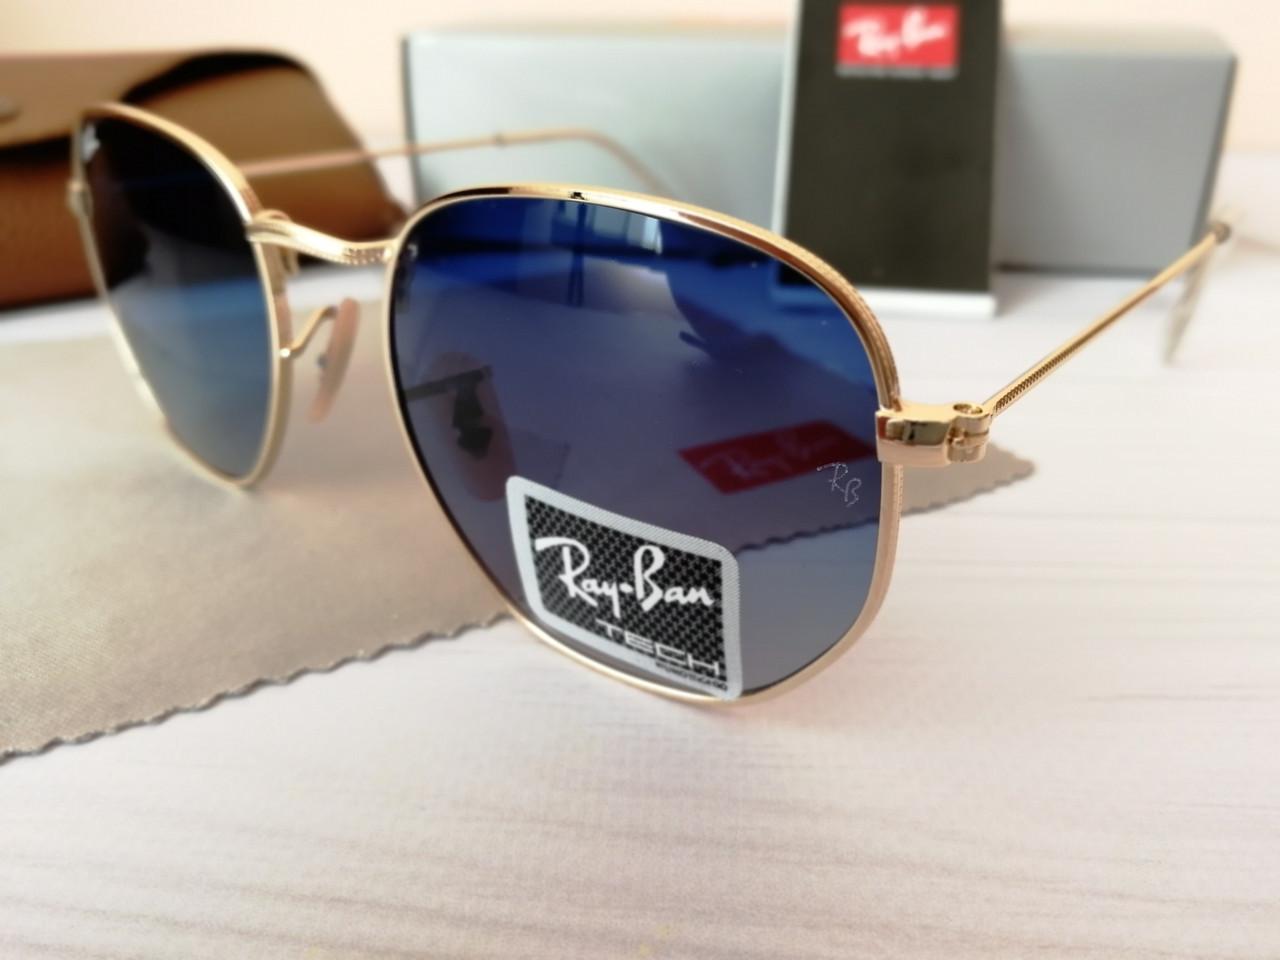 Cолнцезащитные очки Ray-Ban (копия)